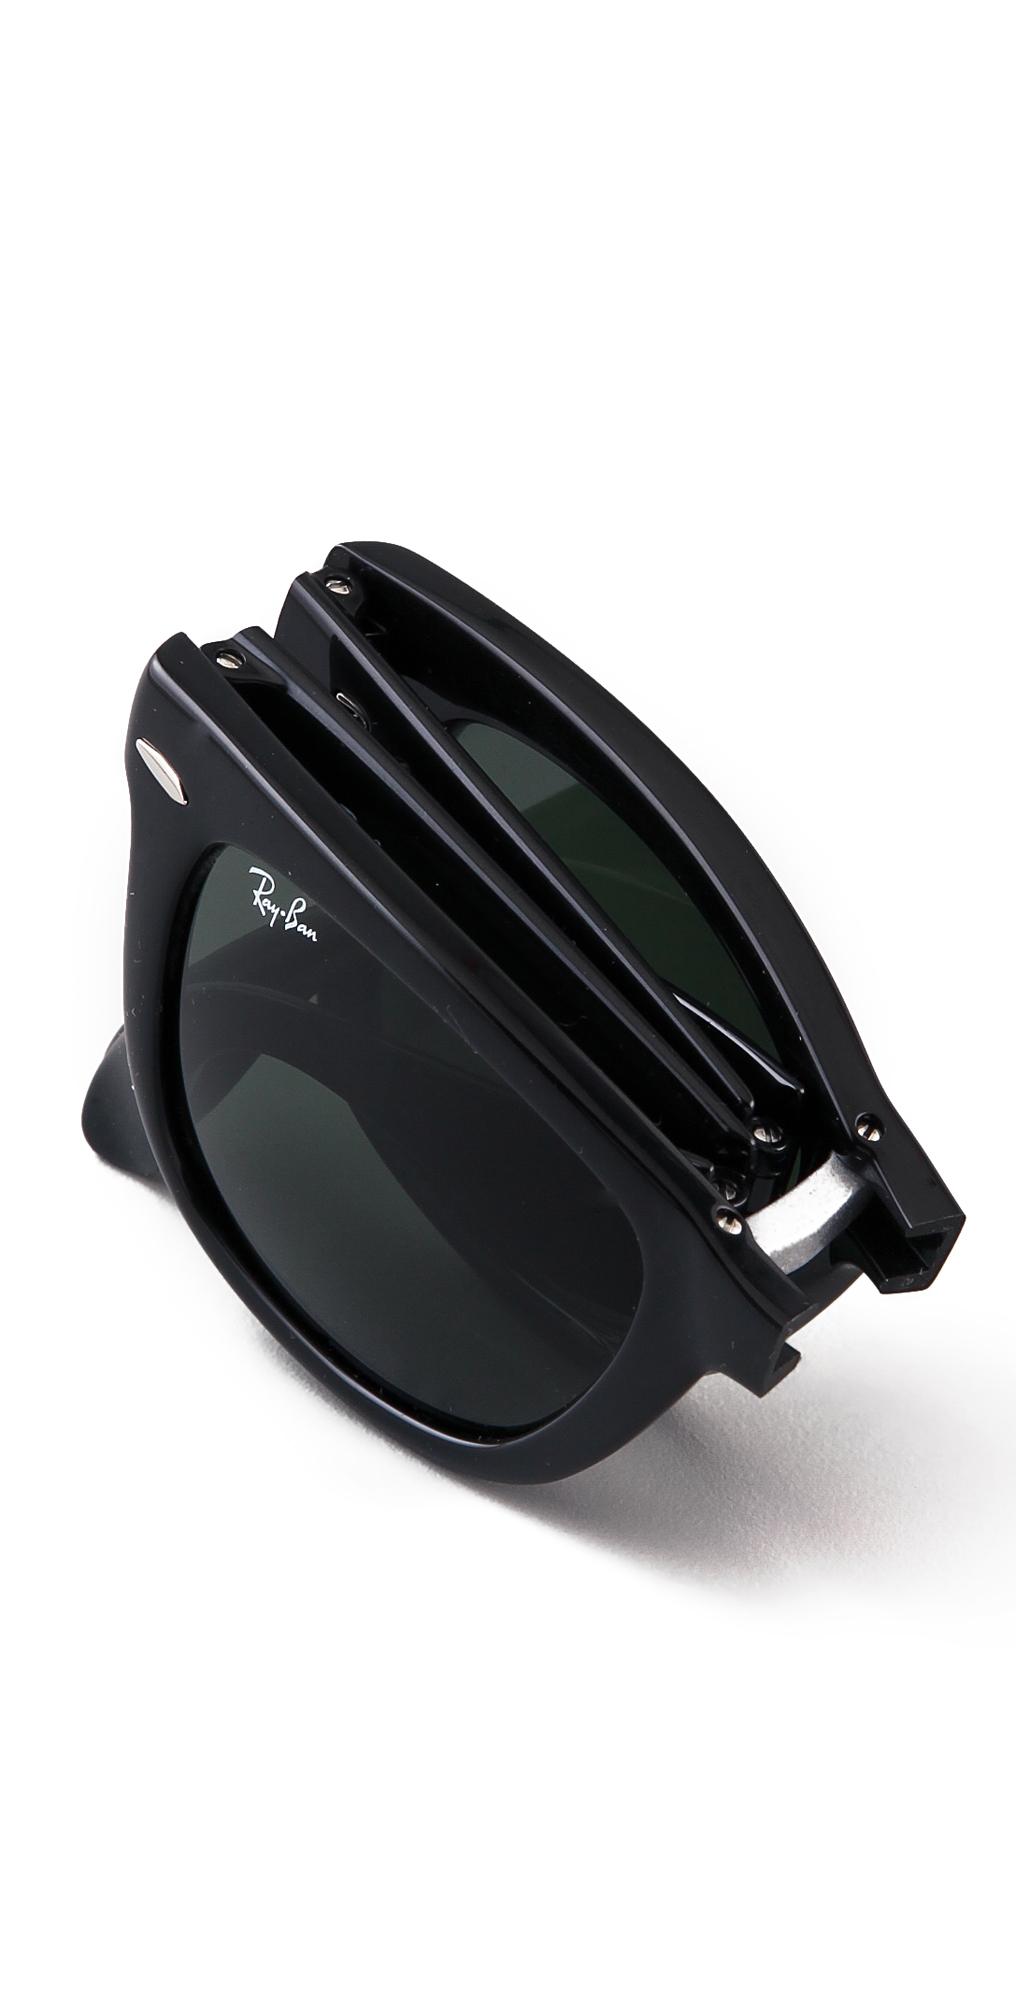 ray-ban-blackgreen-folding-wayfarer-sunglasses-product-1-13453195-492608285.jpeg